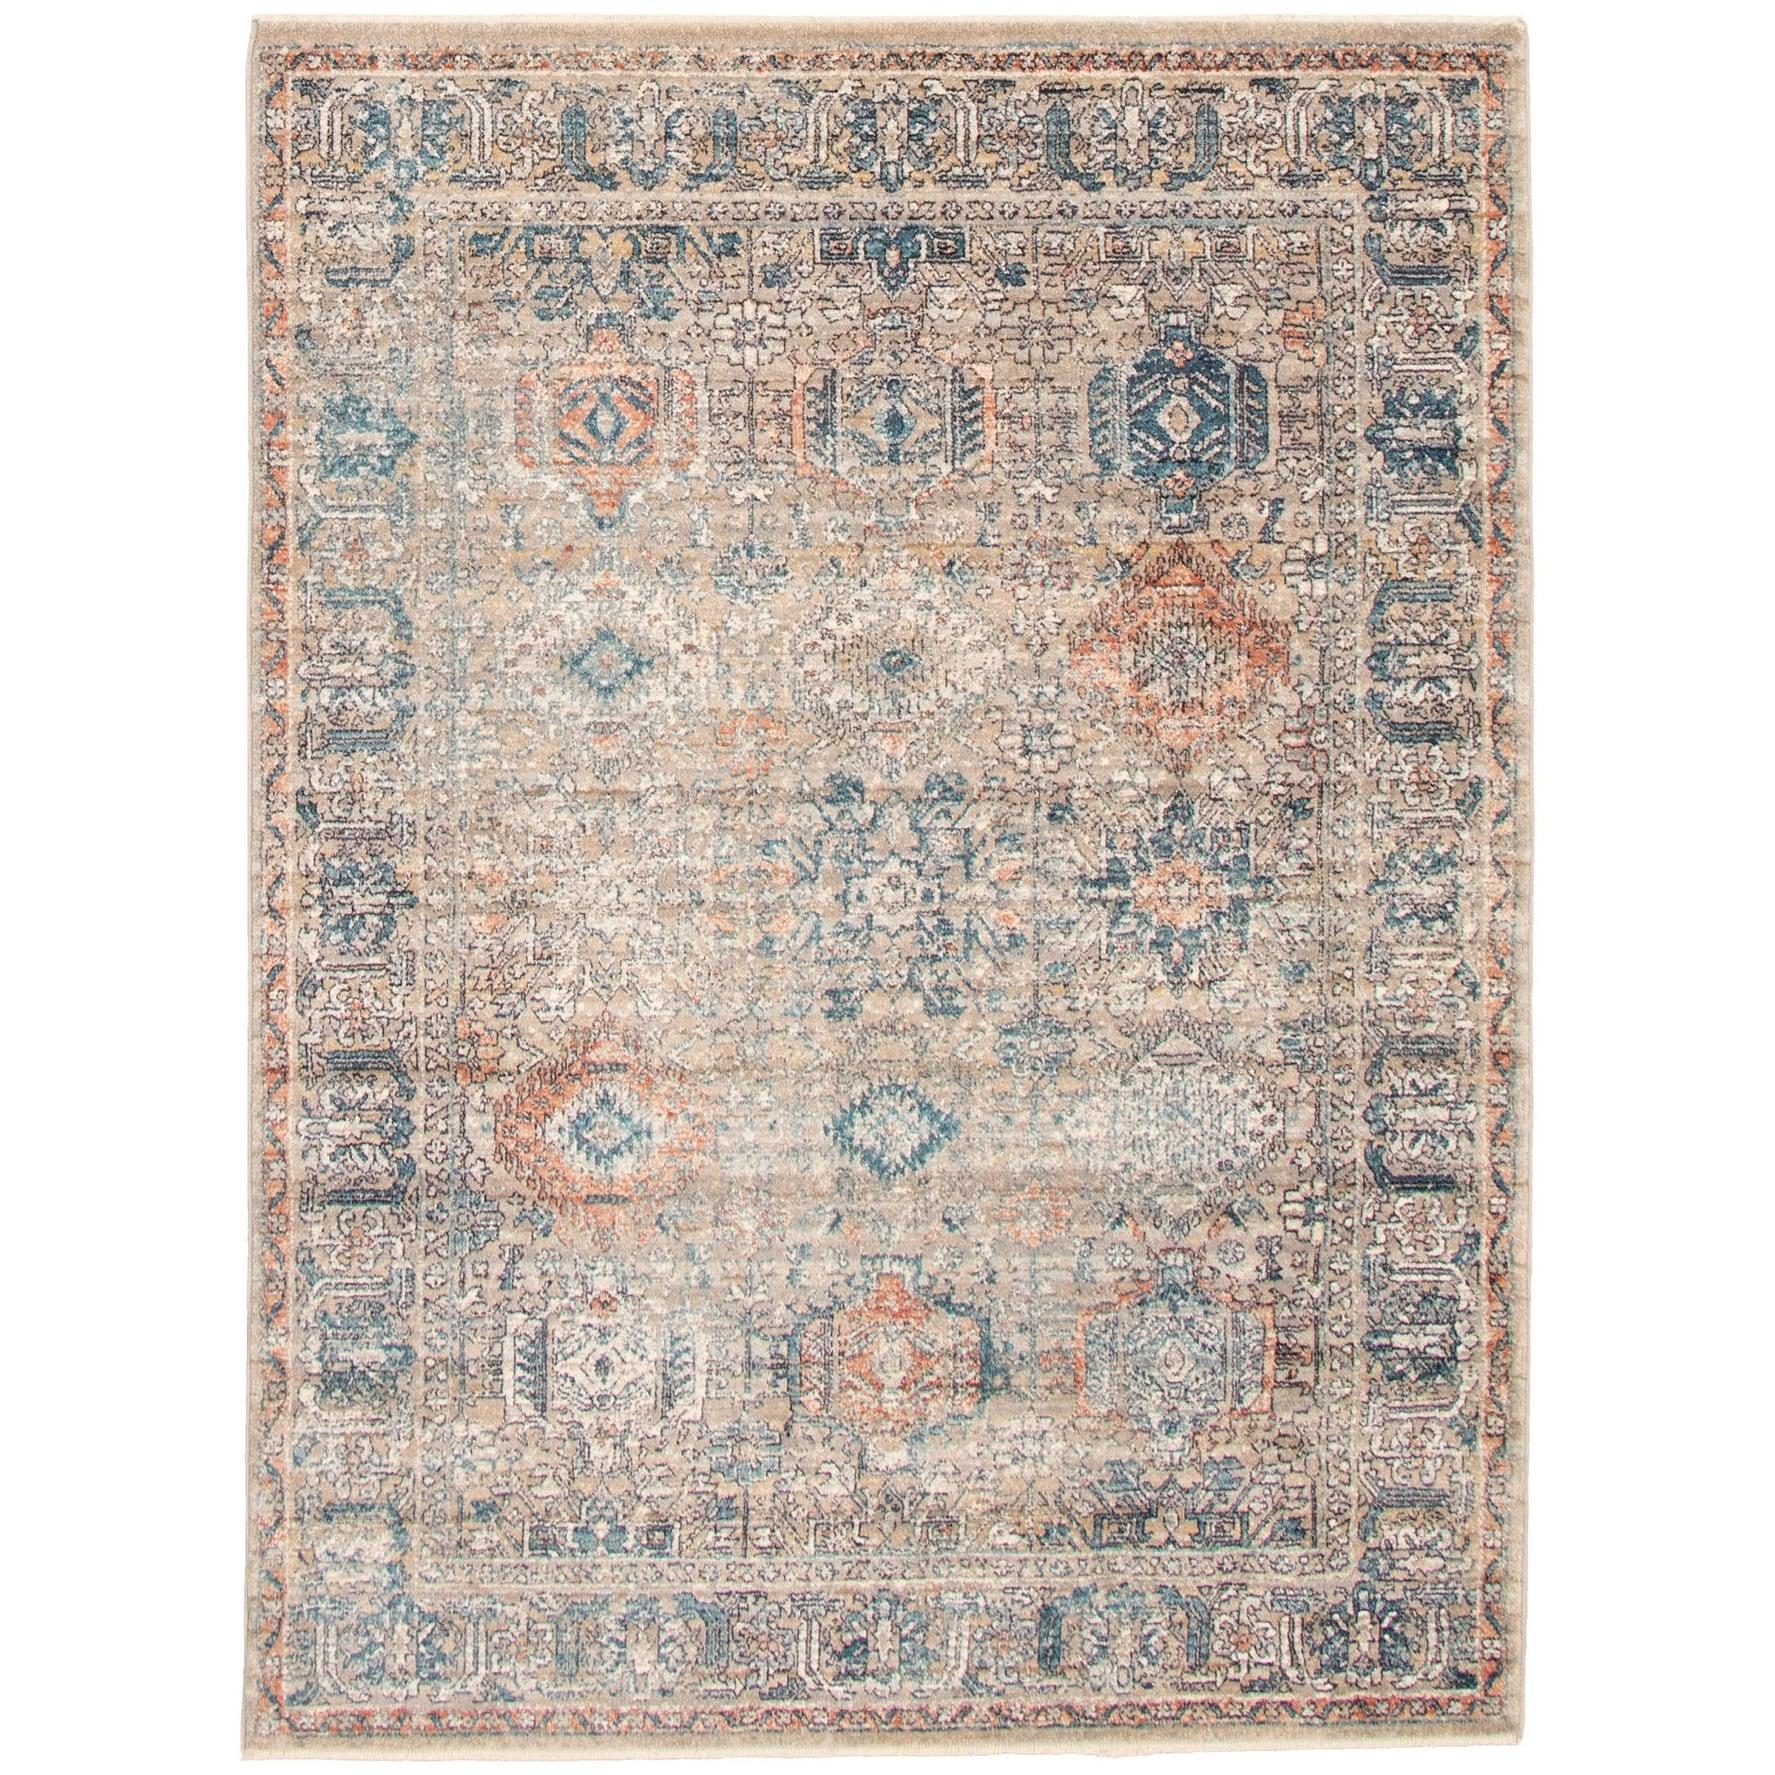 Shop Ecarpetgallery Bolivia Yalameh Blue Grey Polypropylene Rug 6 7 X 8 6 On Sale Overstock 31634271